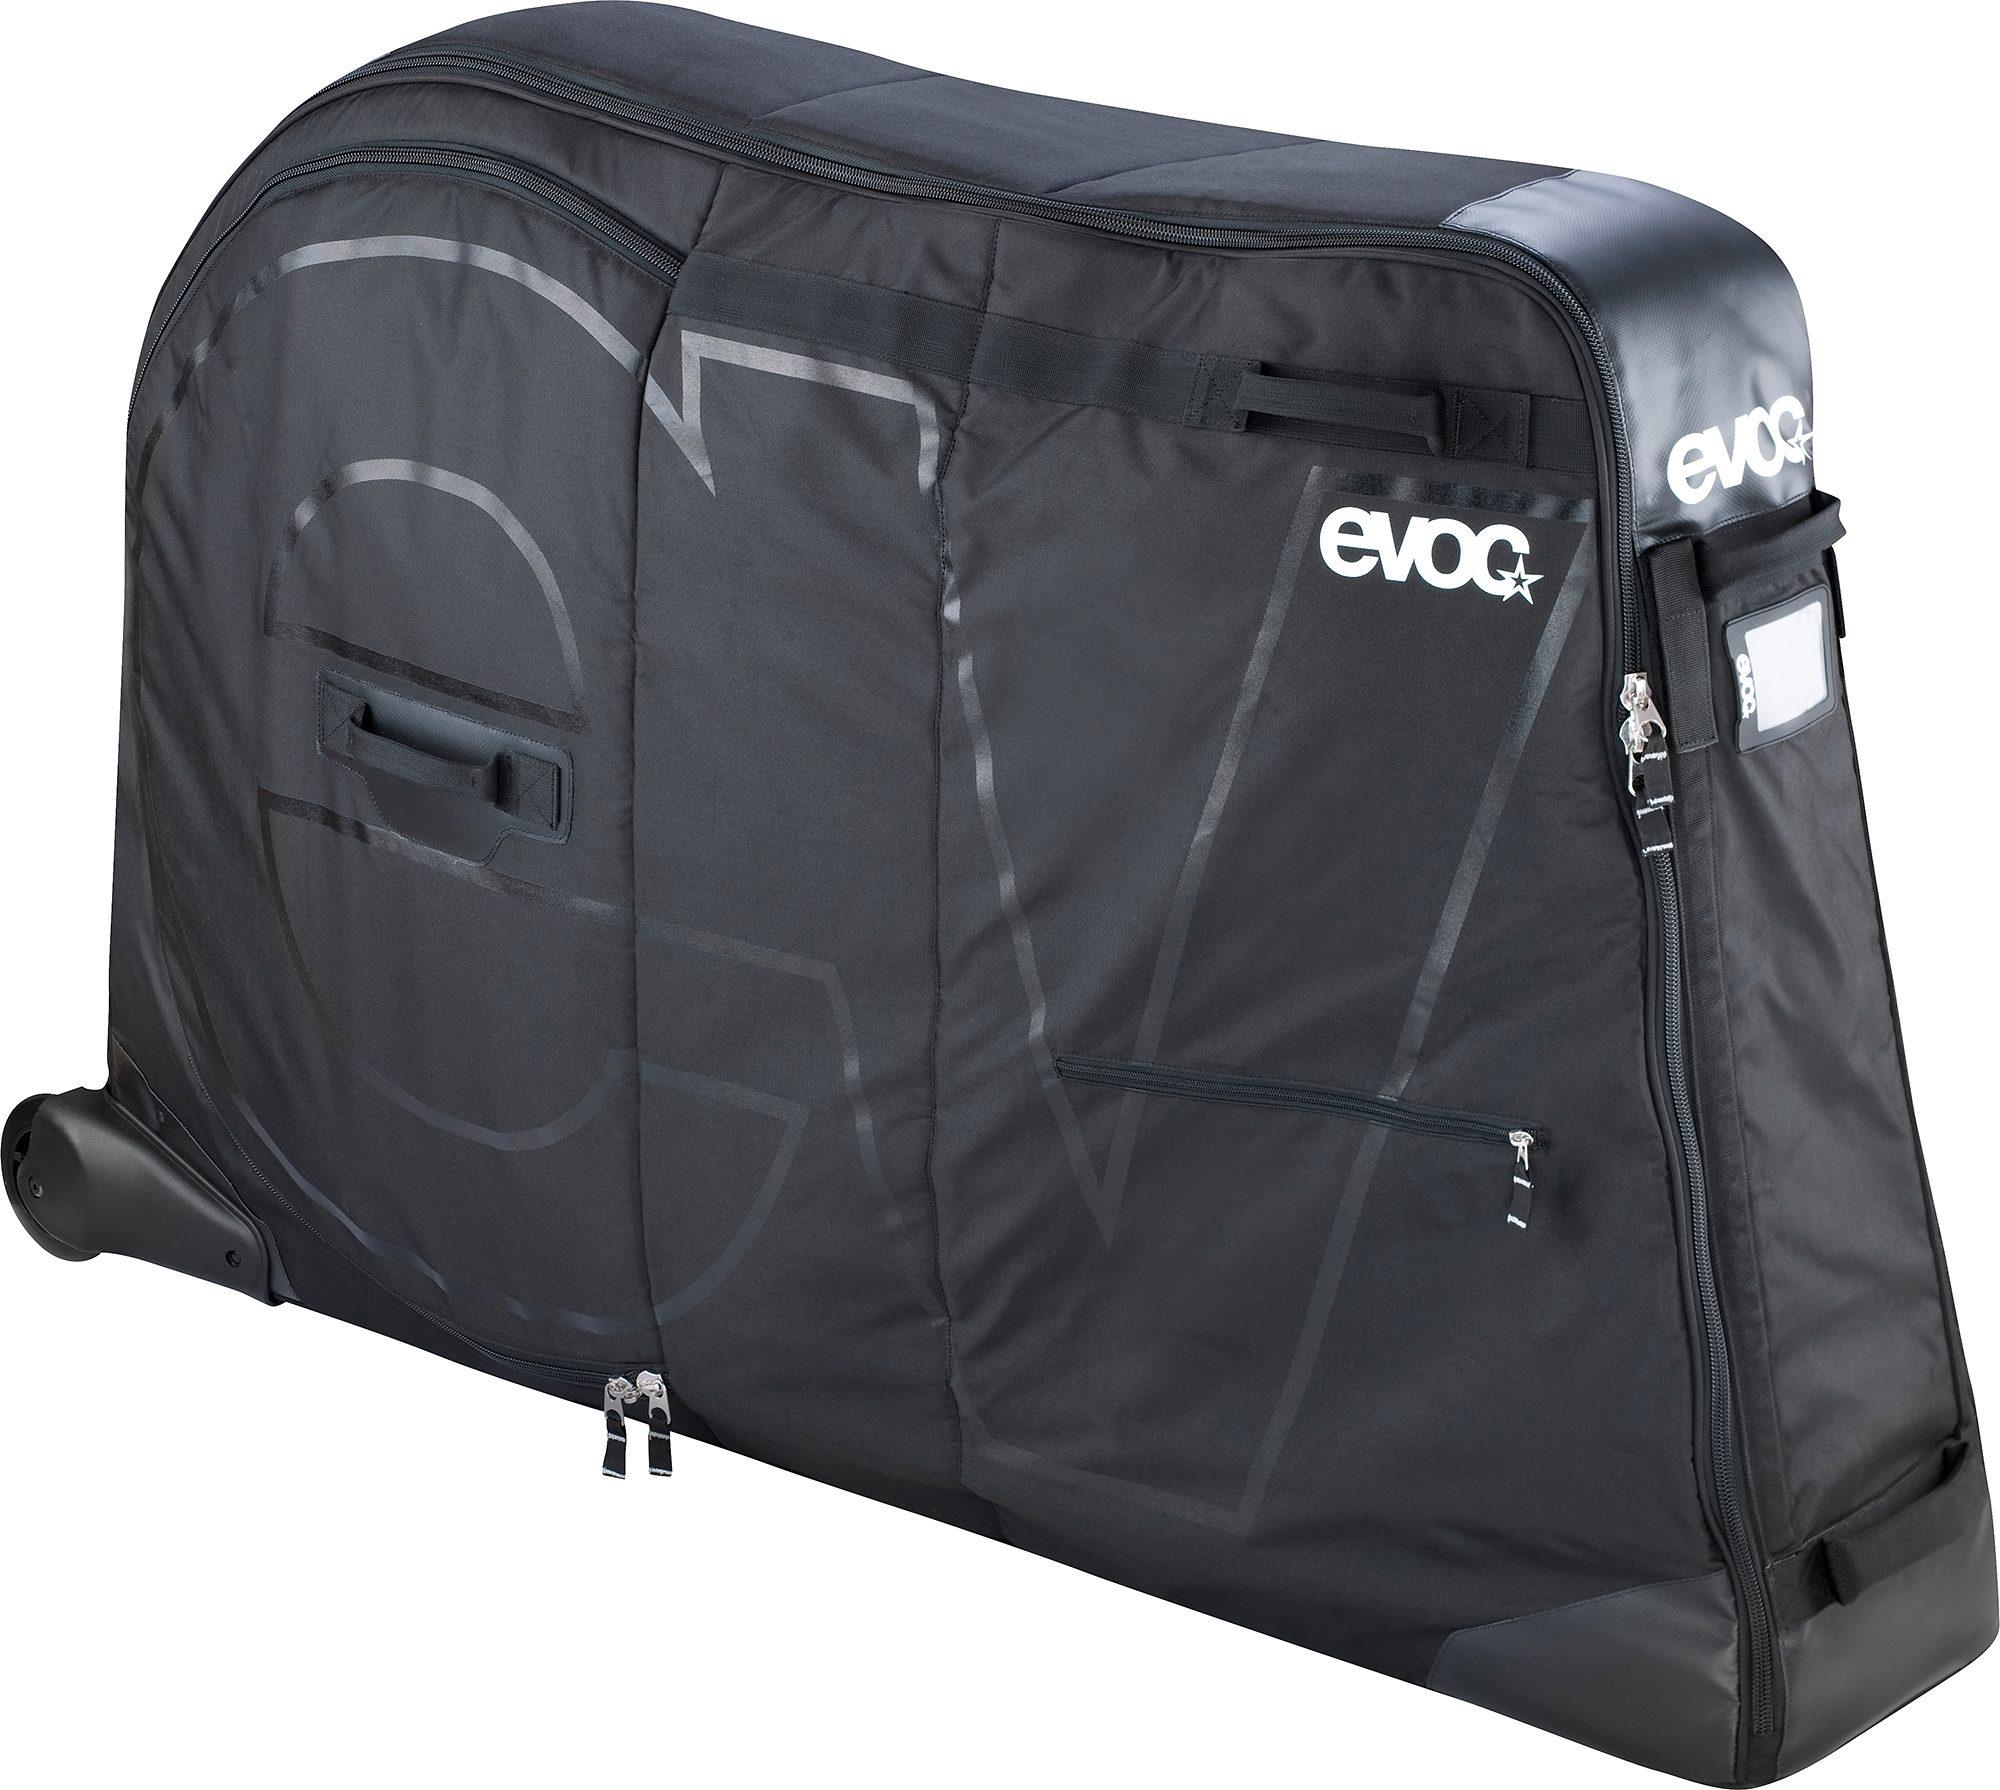 EVOC Fahrradtasche »Bike Travel«